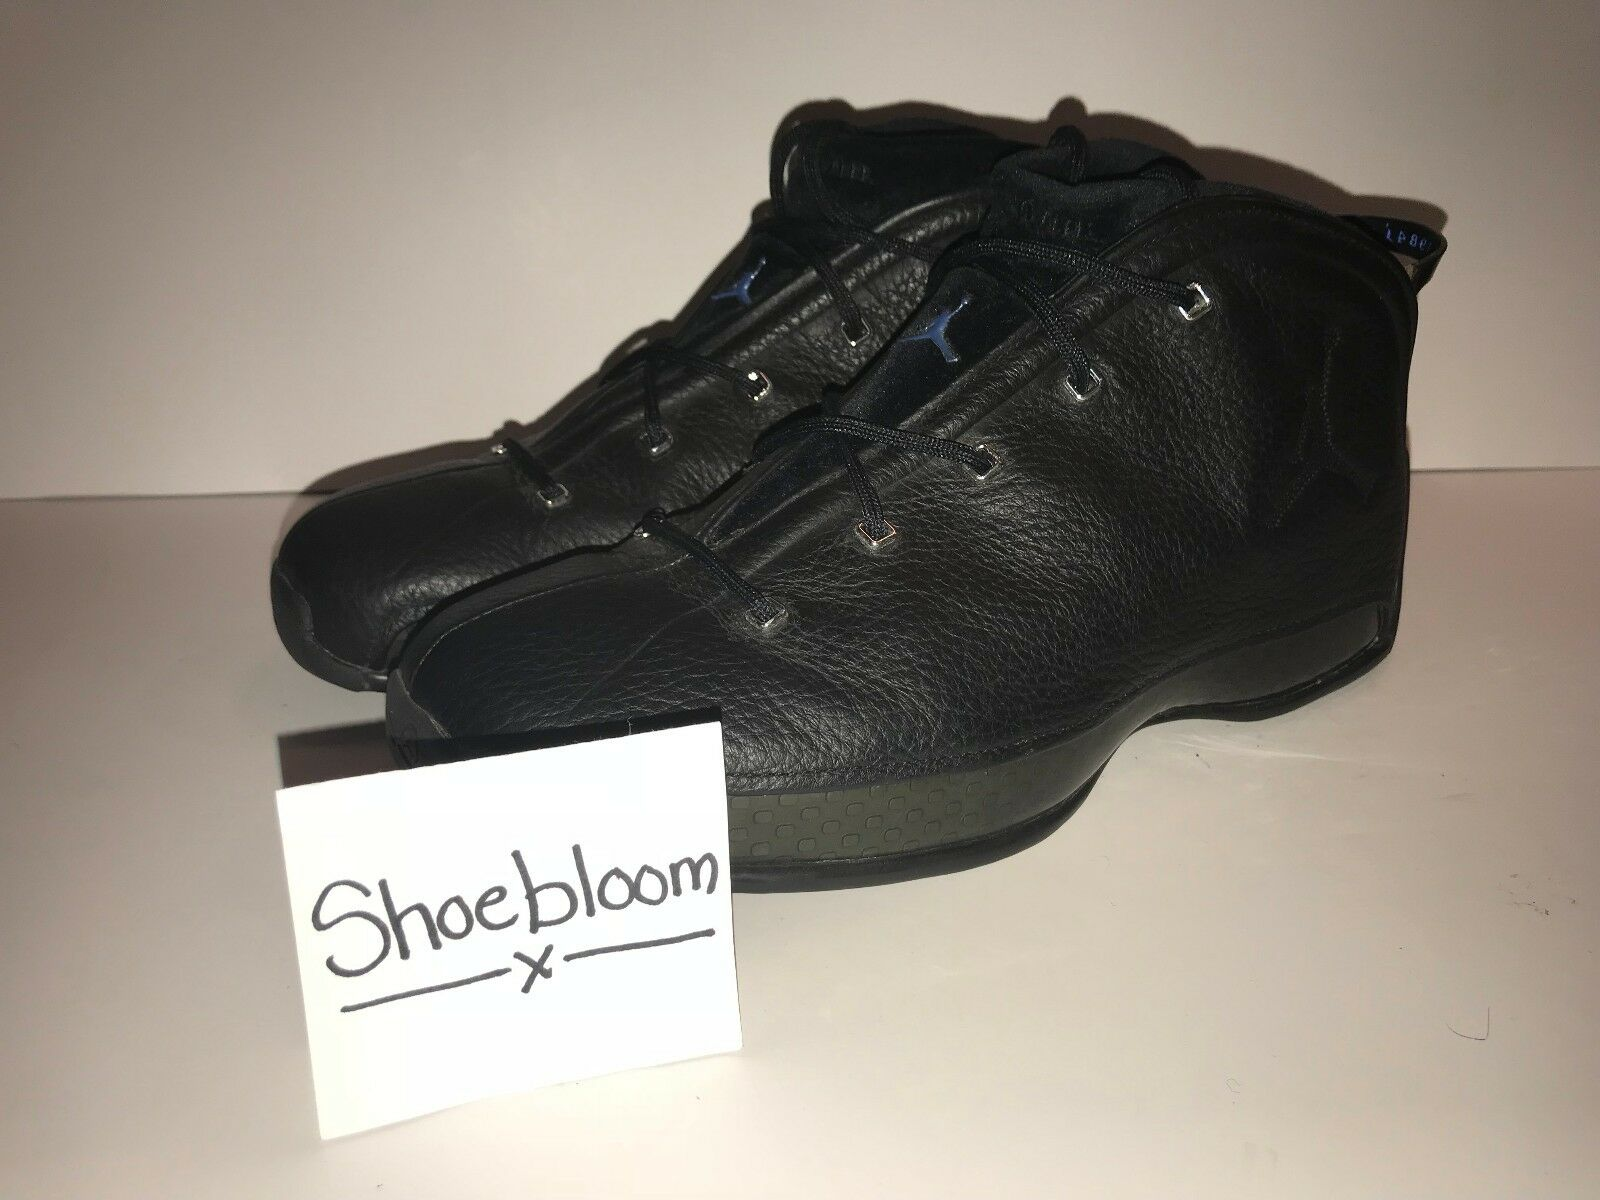 Jordan XVIII.5 18.5 Mike Bibby PE Size 11.5 100% Authentic